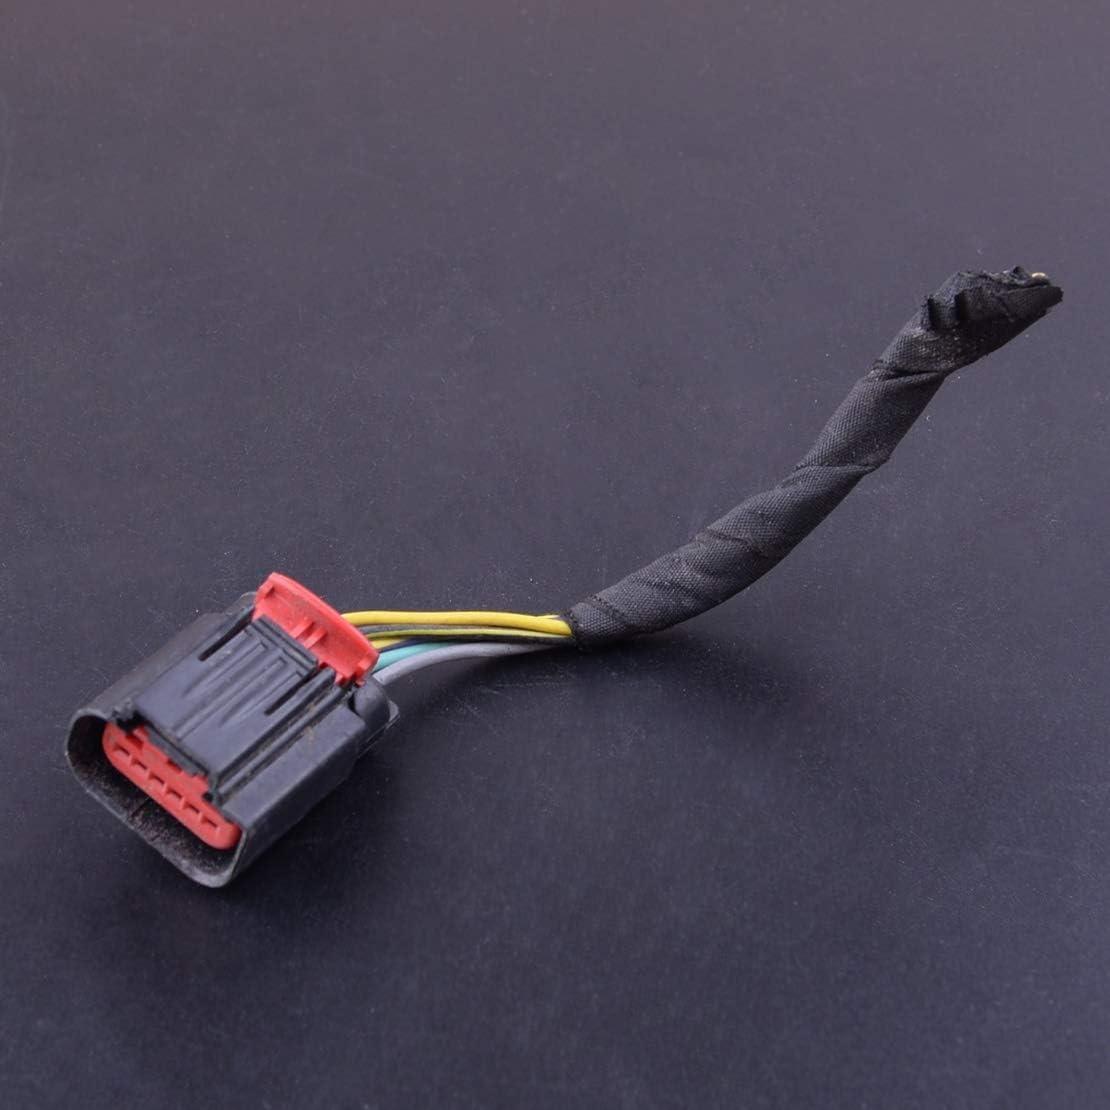 MSJFUBANGBM Sensor de Flujo de Masa de Aire CITALL cableado el/éctrico Conector de Clavija en Forma for Peugeot Boxer Citroen Relay Fiat Ducato